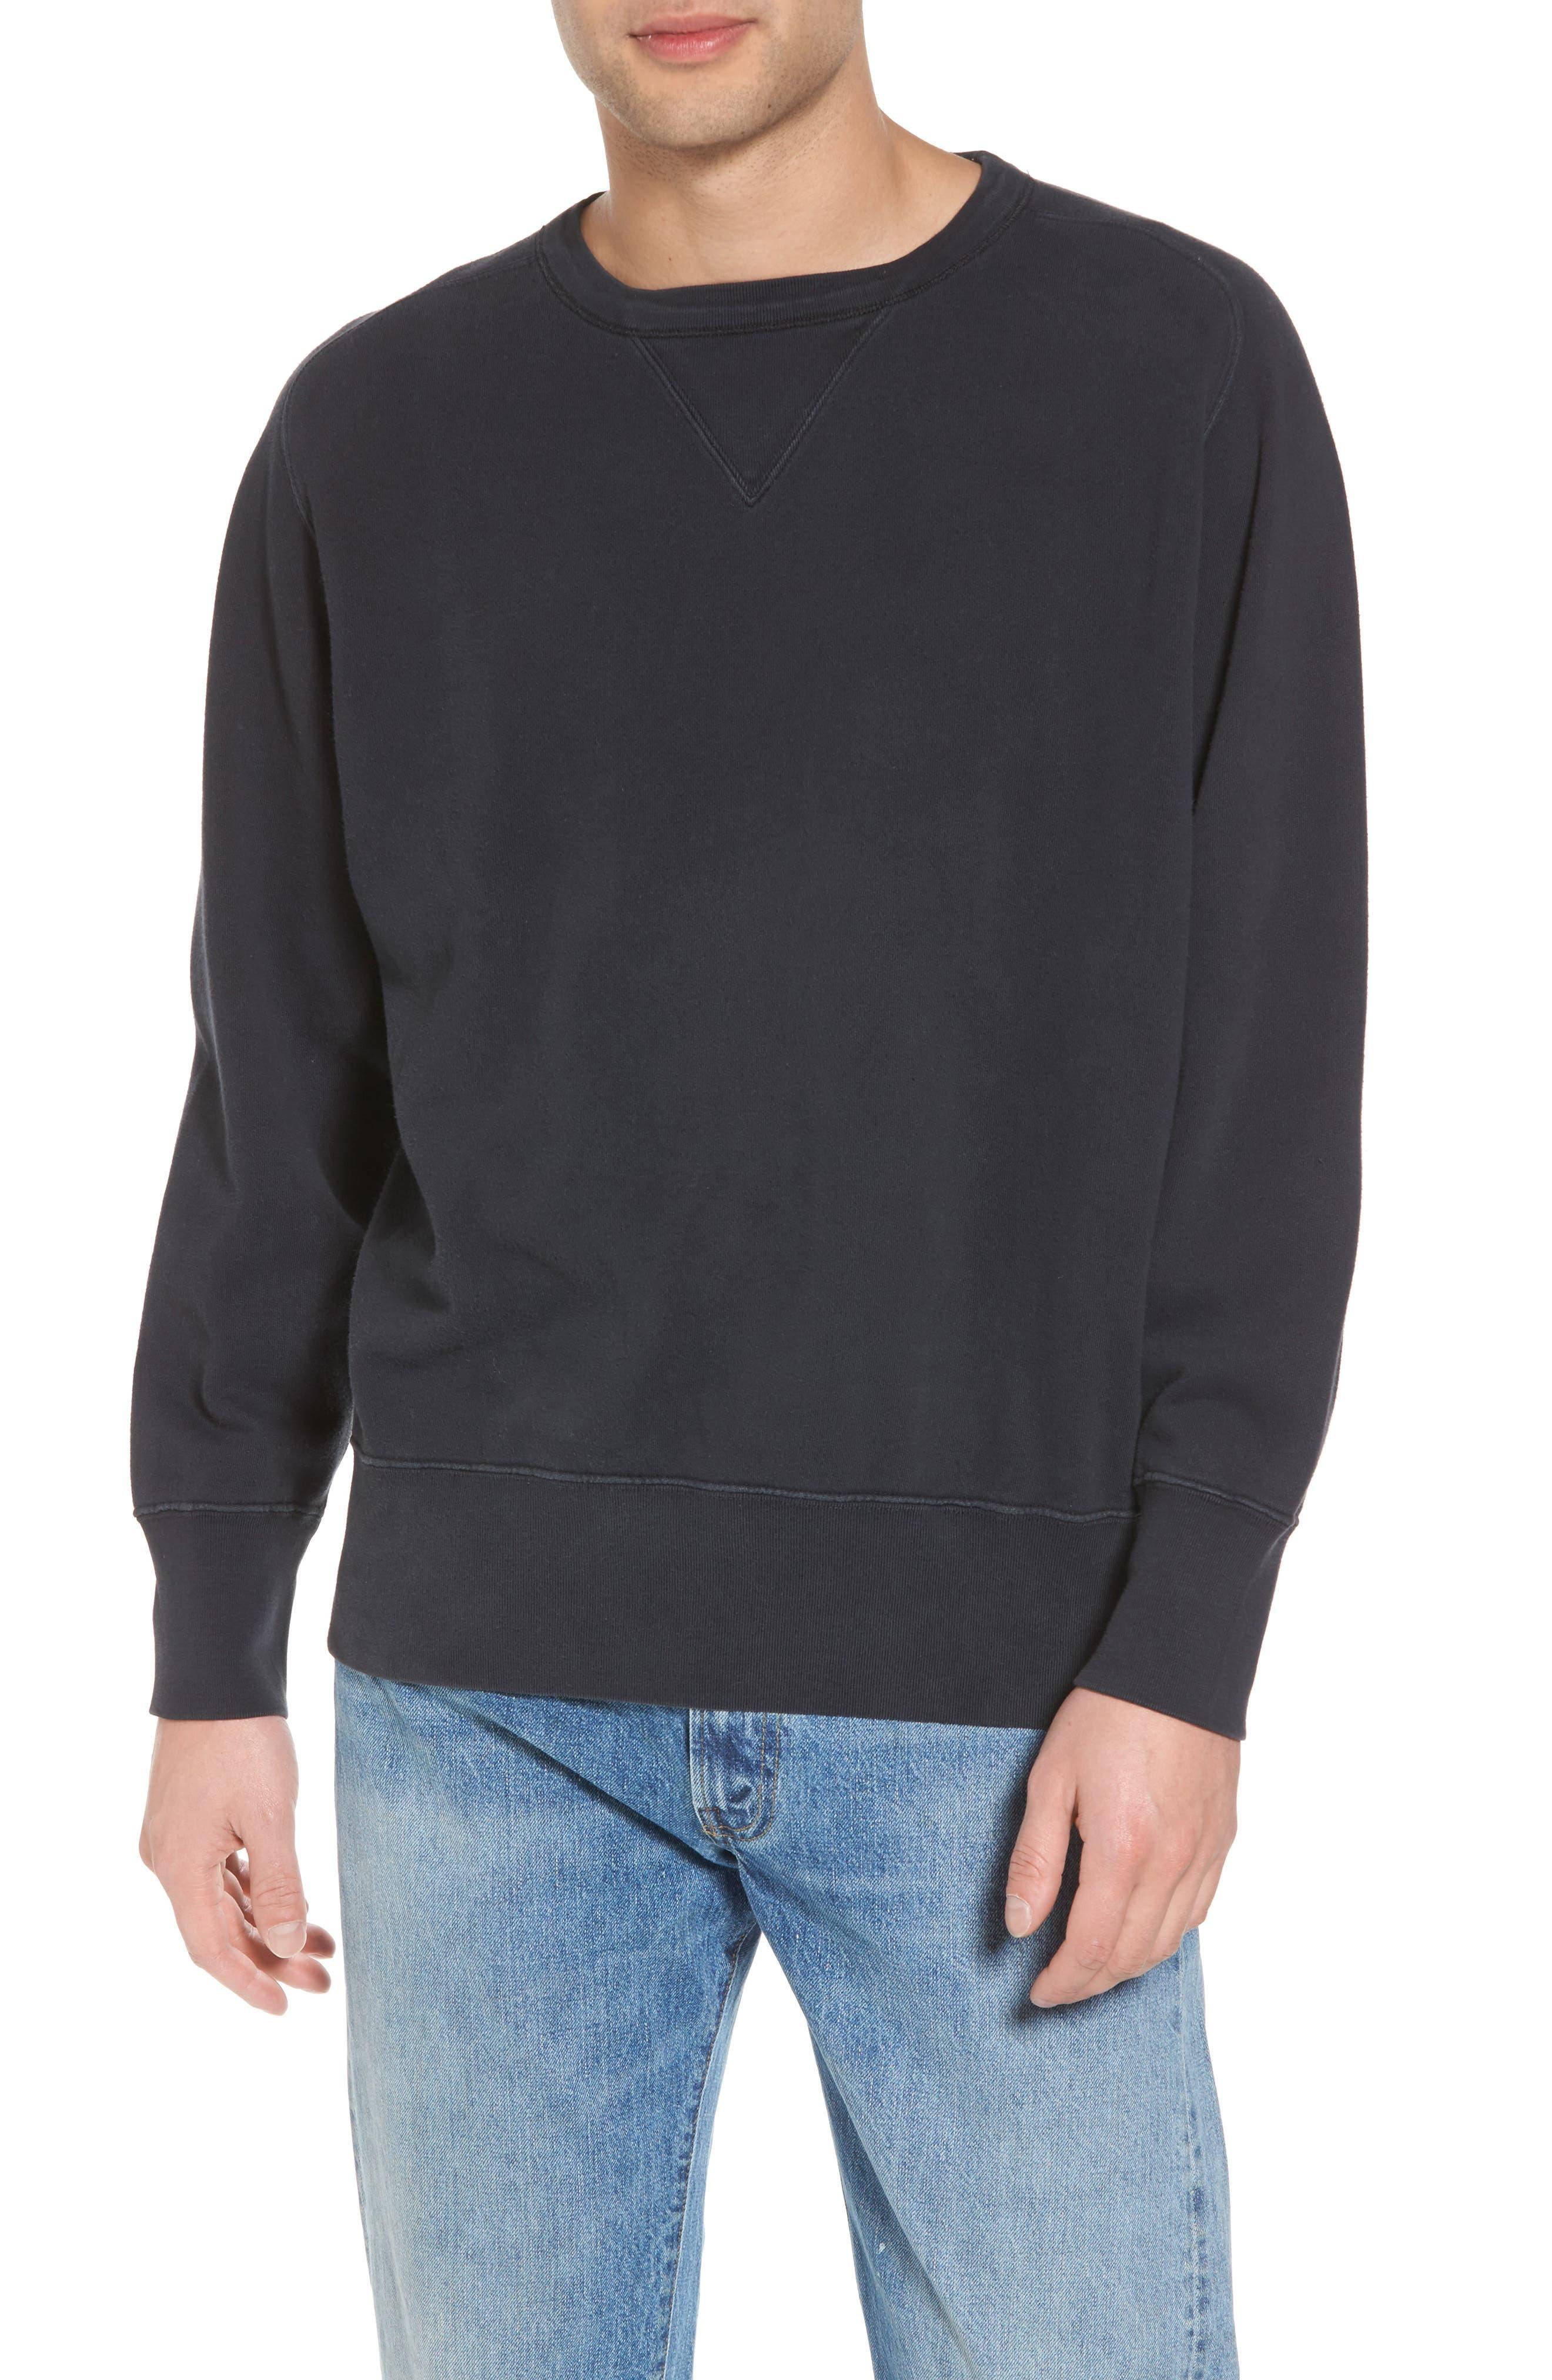 Levi's® Vintage Clothing Bay Meadows Sweatshirt